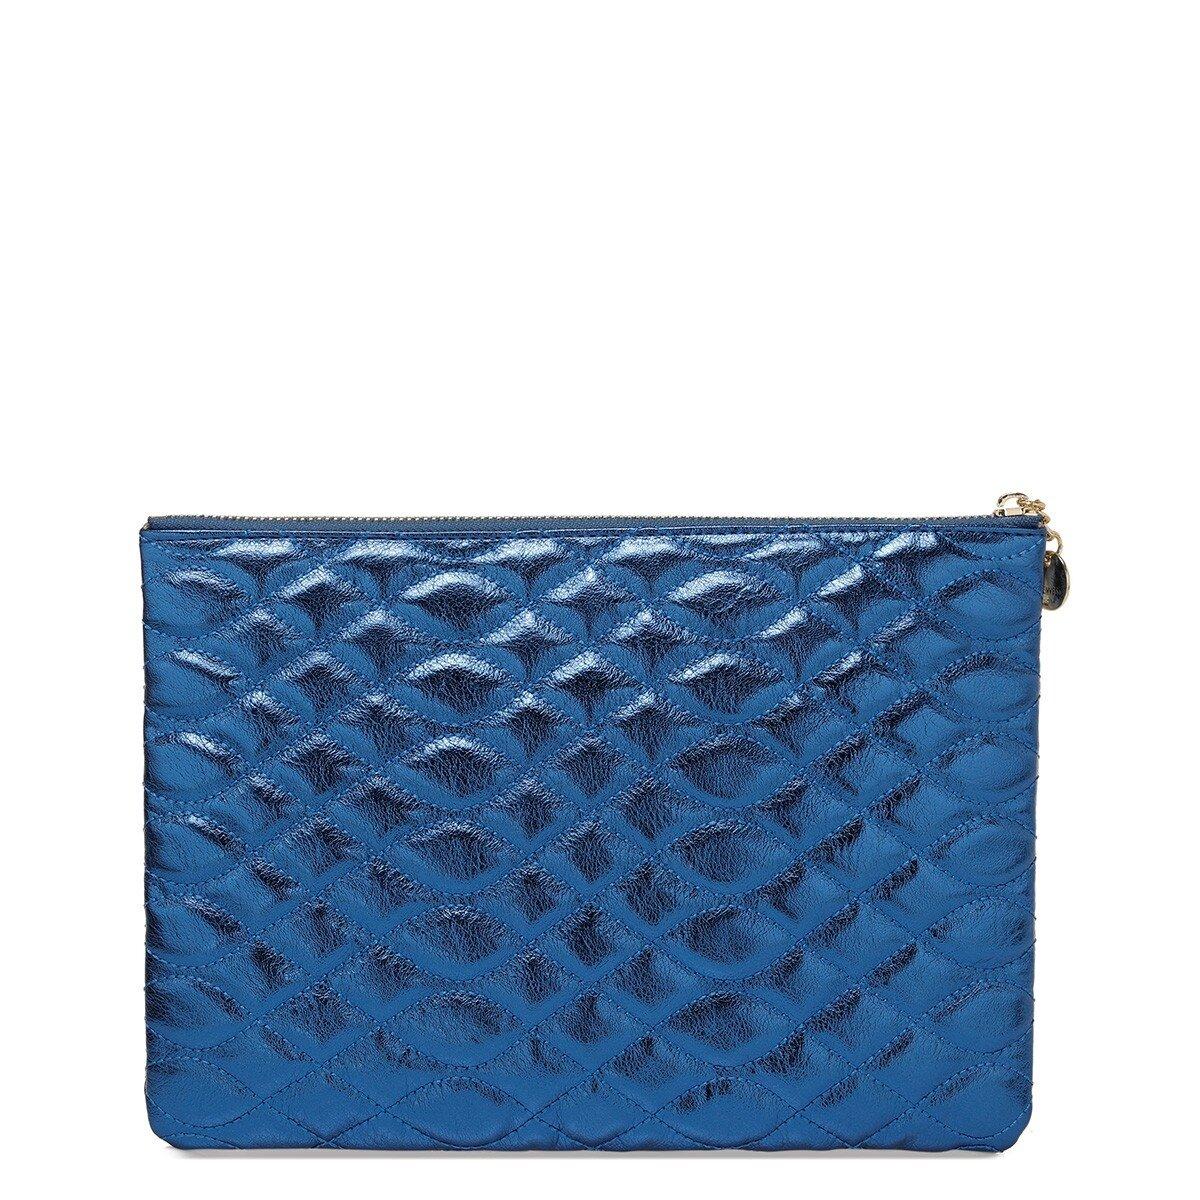 DANY 1FX Mavi Kadın Portföy Çanta